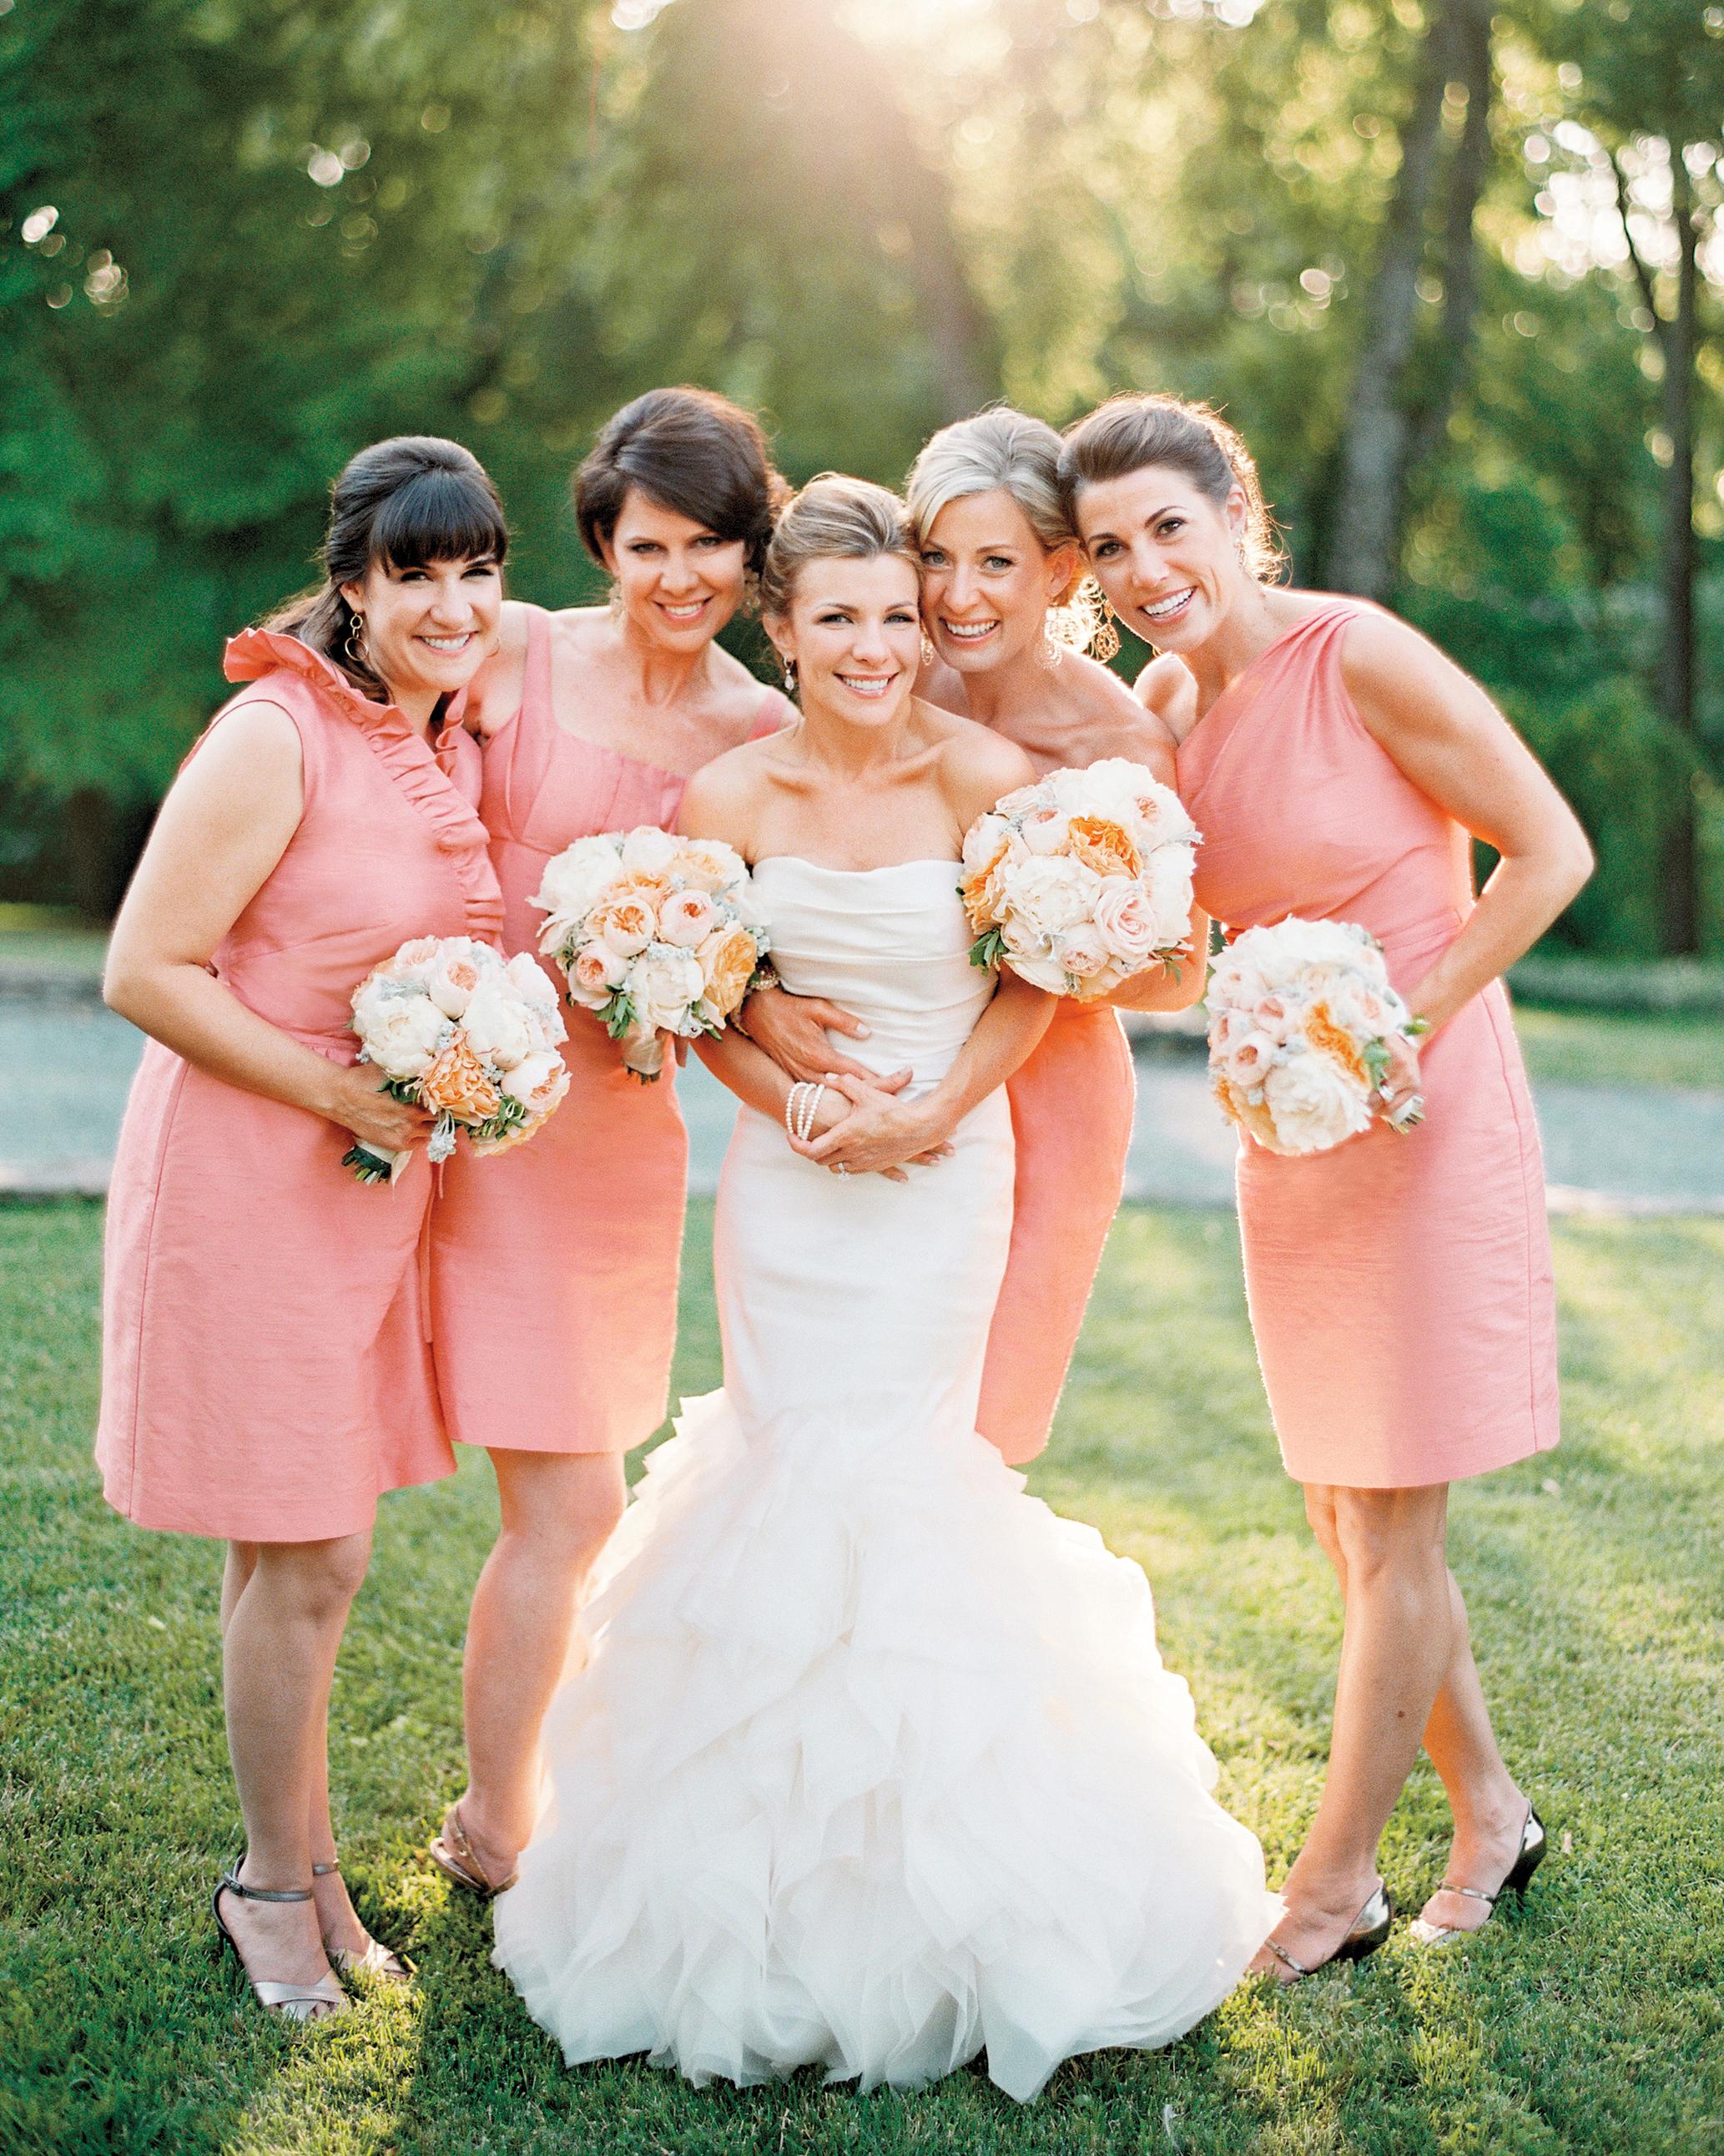 joanna-kyle-real-weddings-bride-bridesmaids-008978-r1-012-d111223.jpg